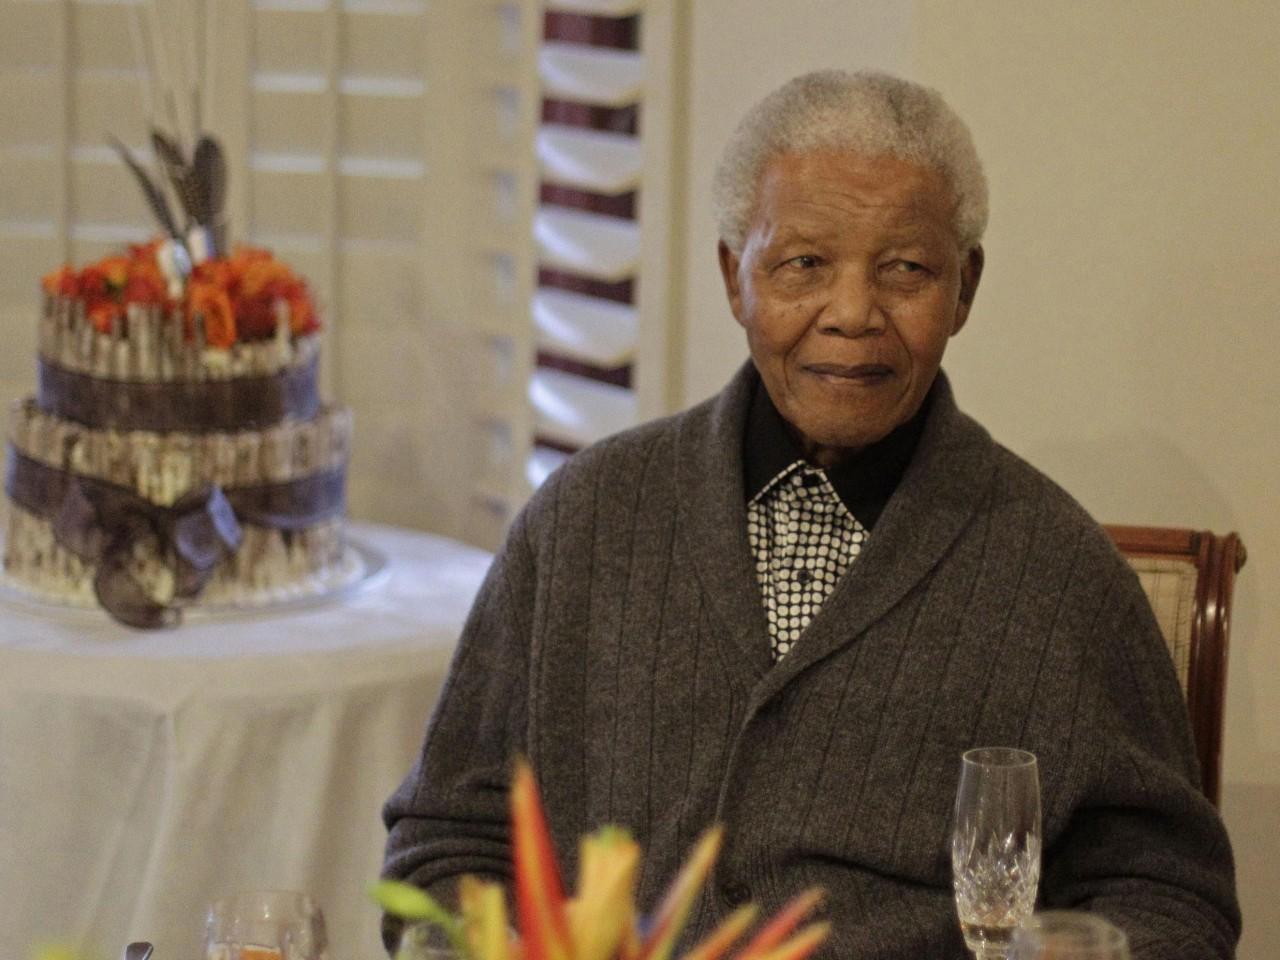 Mandela's death will expose a divided South Africa - Salon.com